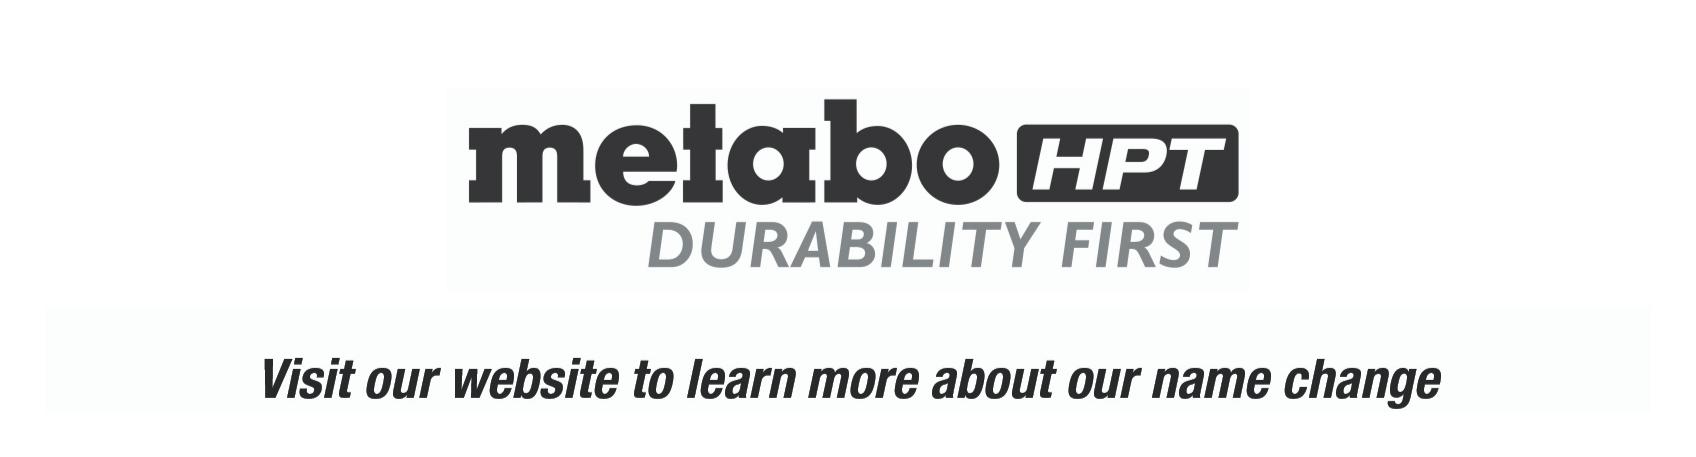 Metabo HPT Sticker Mock up_Durability